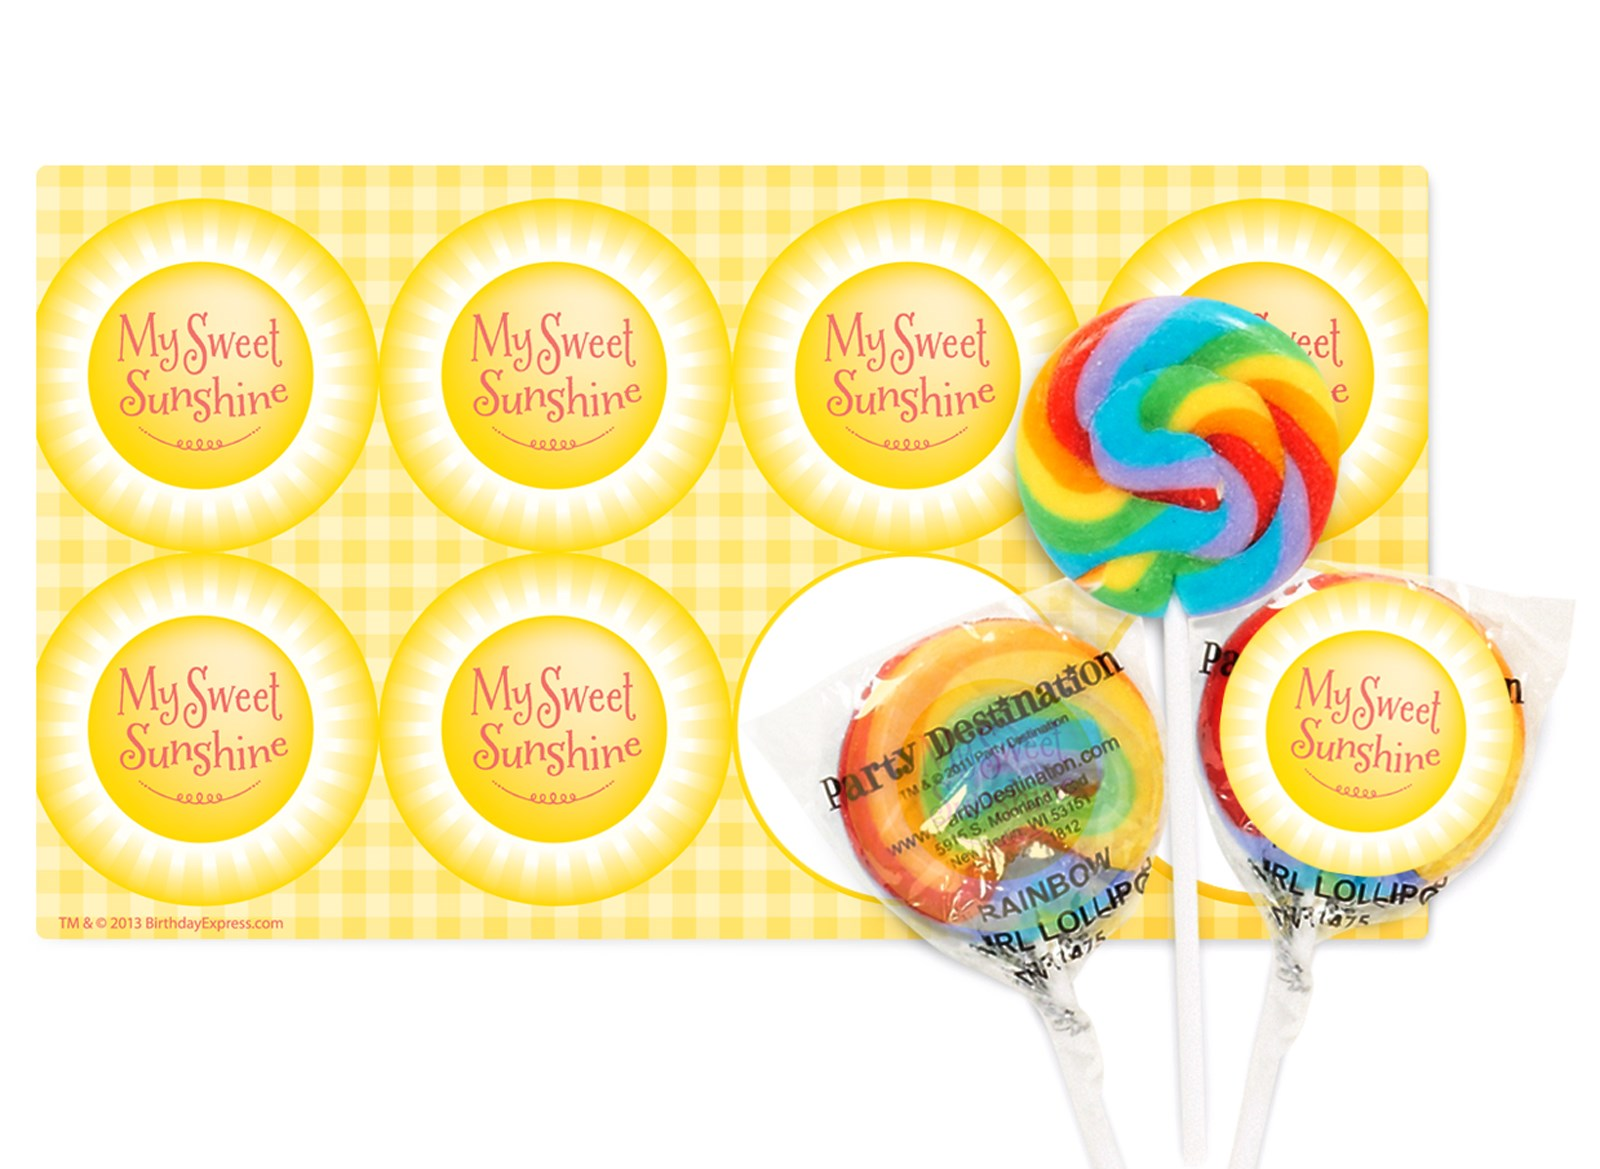 Image of Little Sunshine Party Small Lollipop Sticker Kit